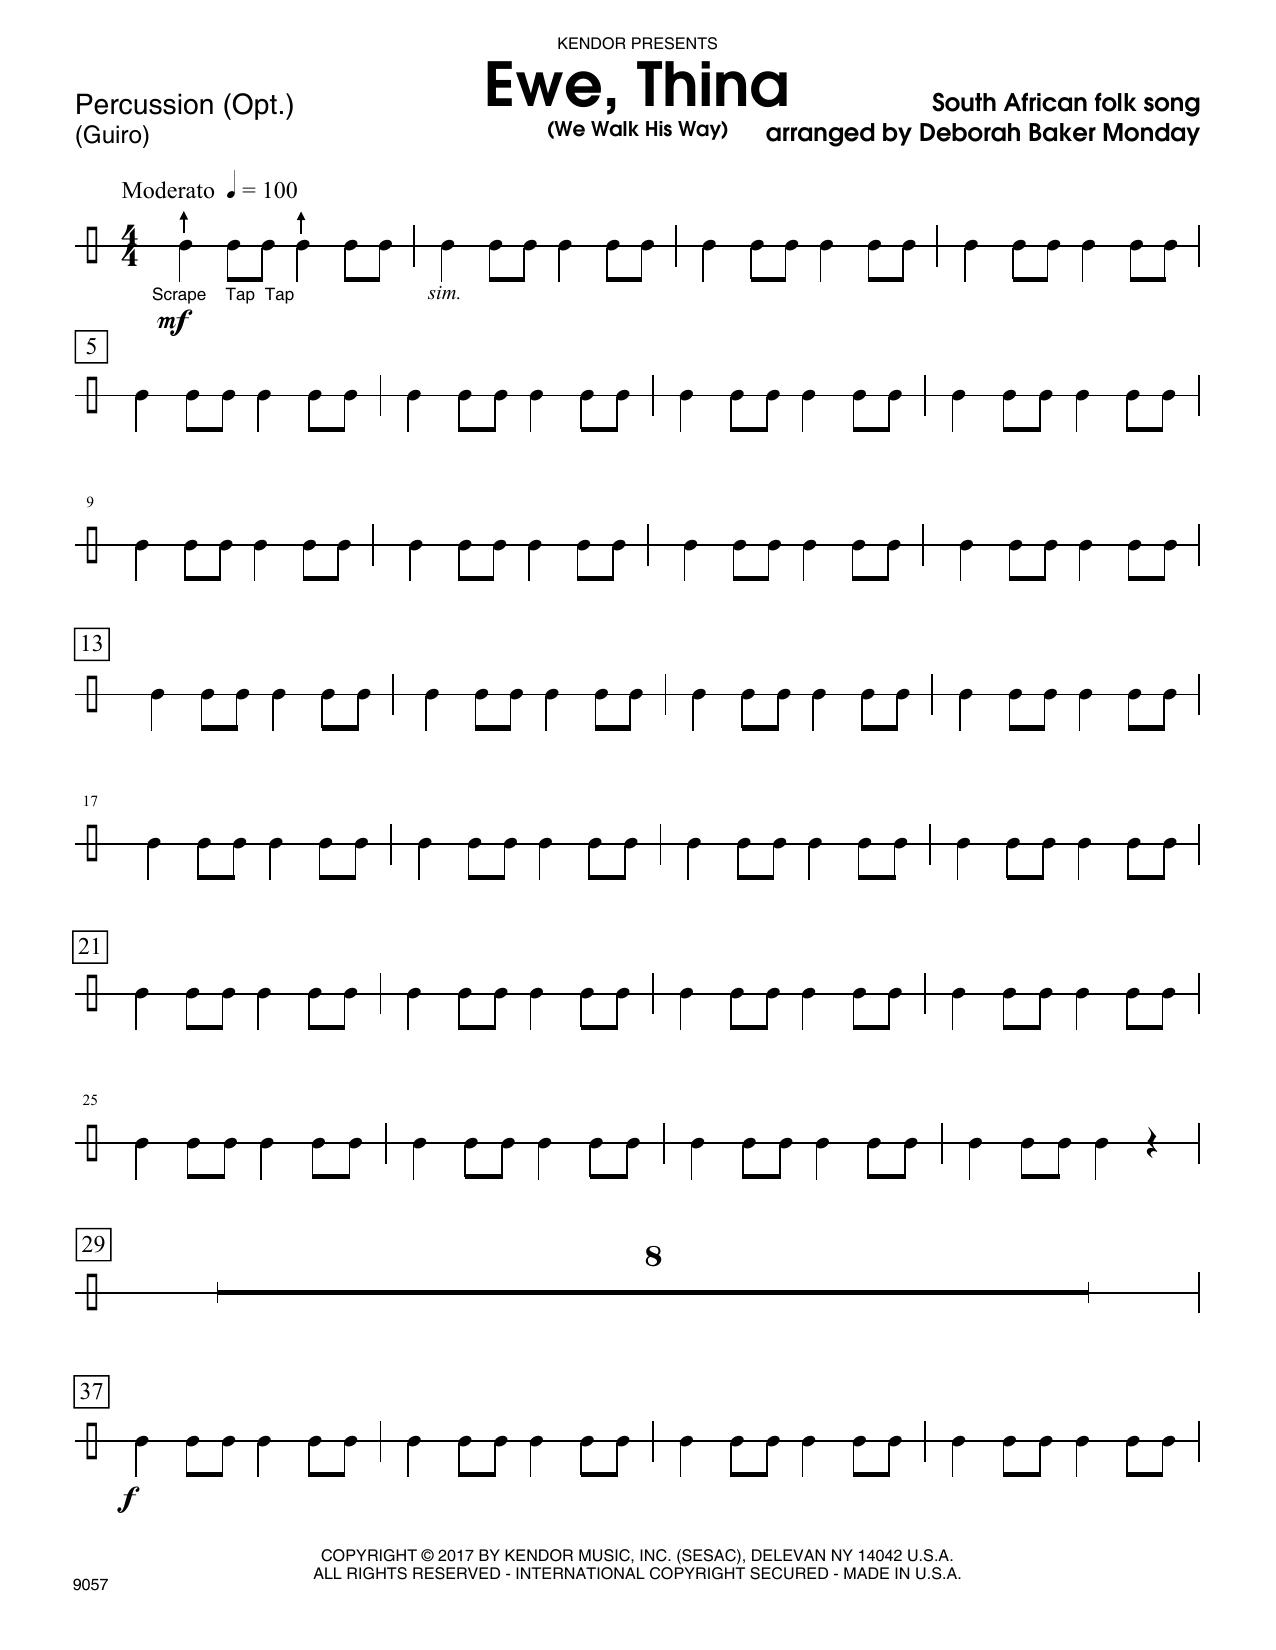 Ewe, Thina (We Walk His Way) - Percussion